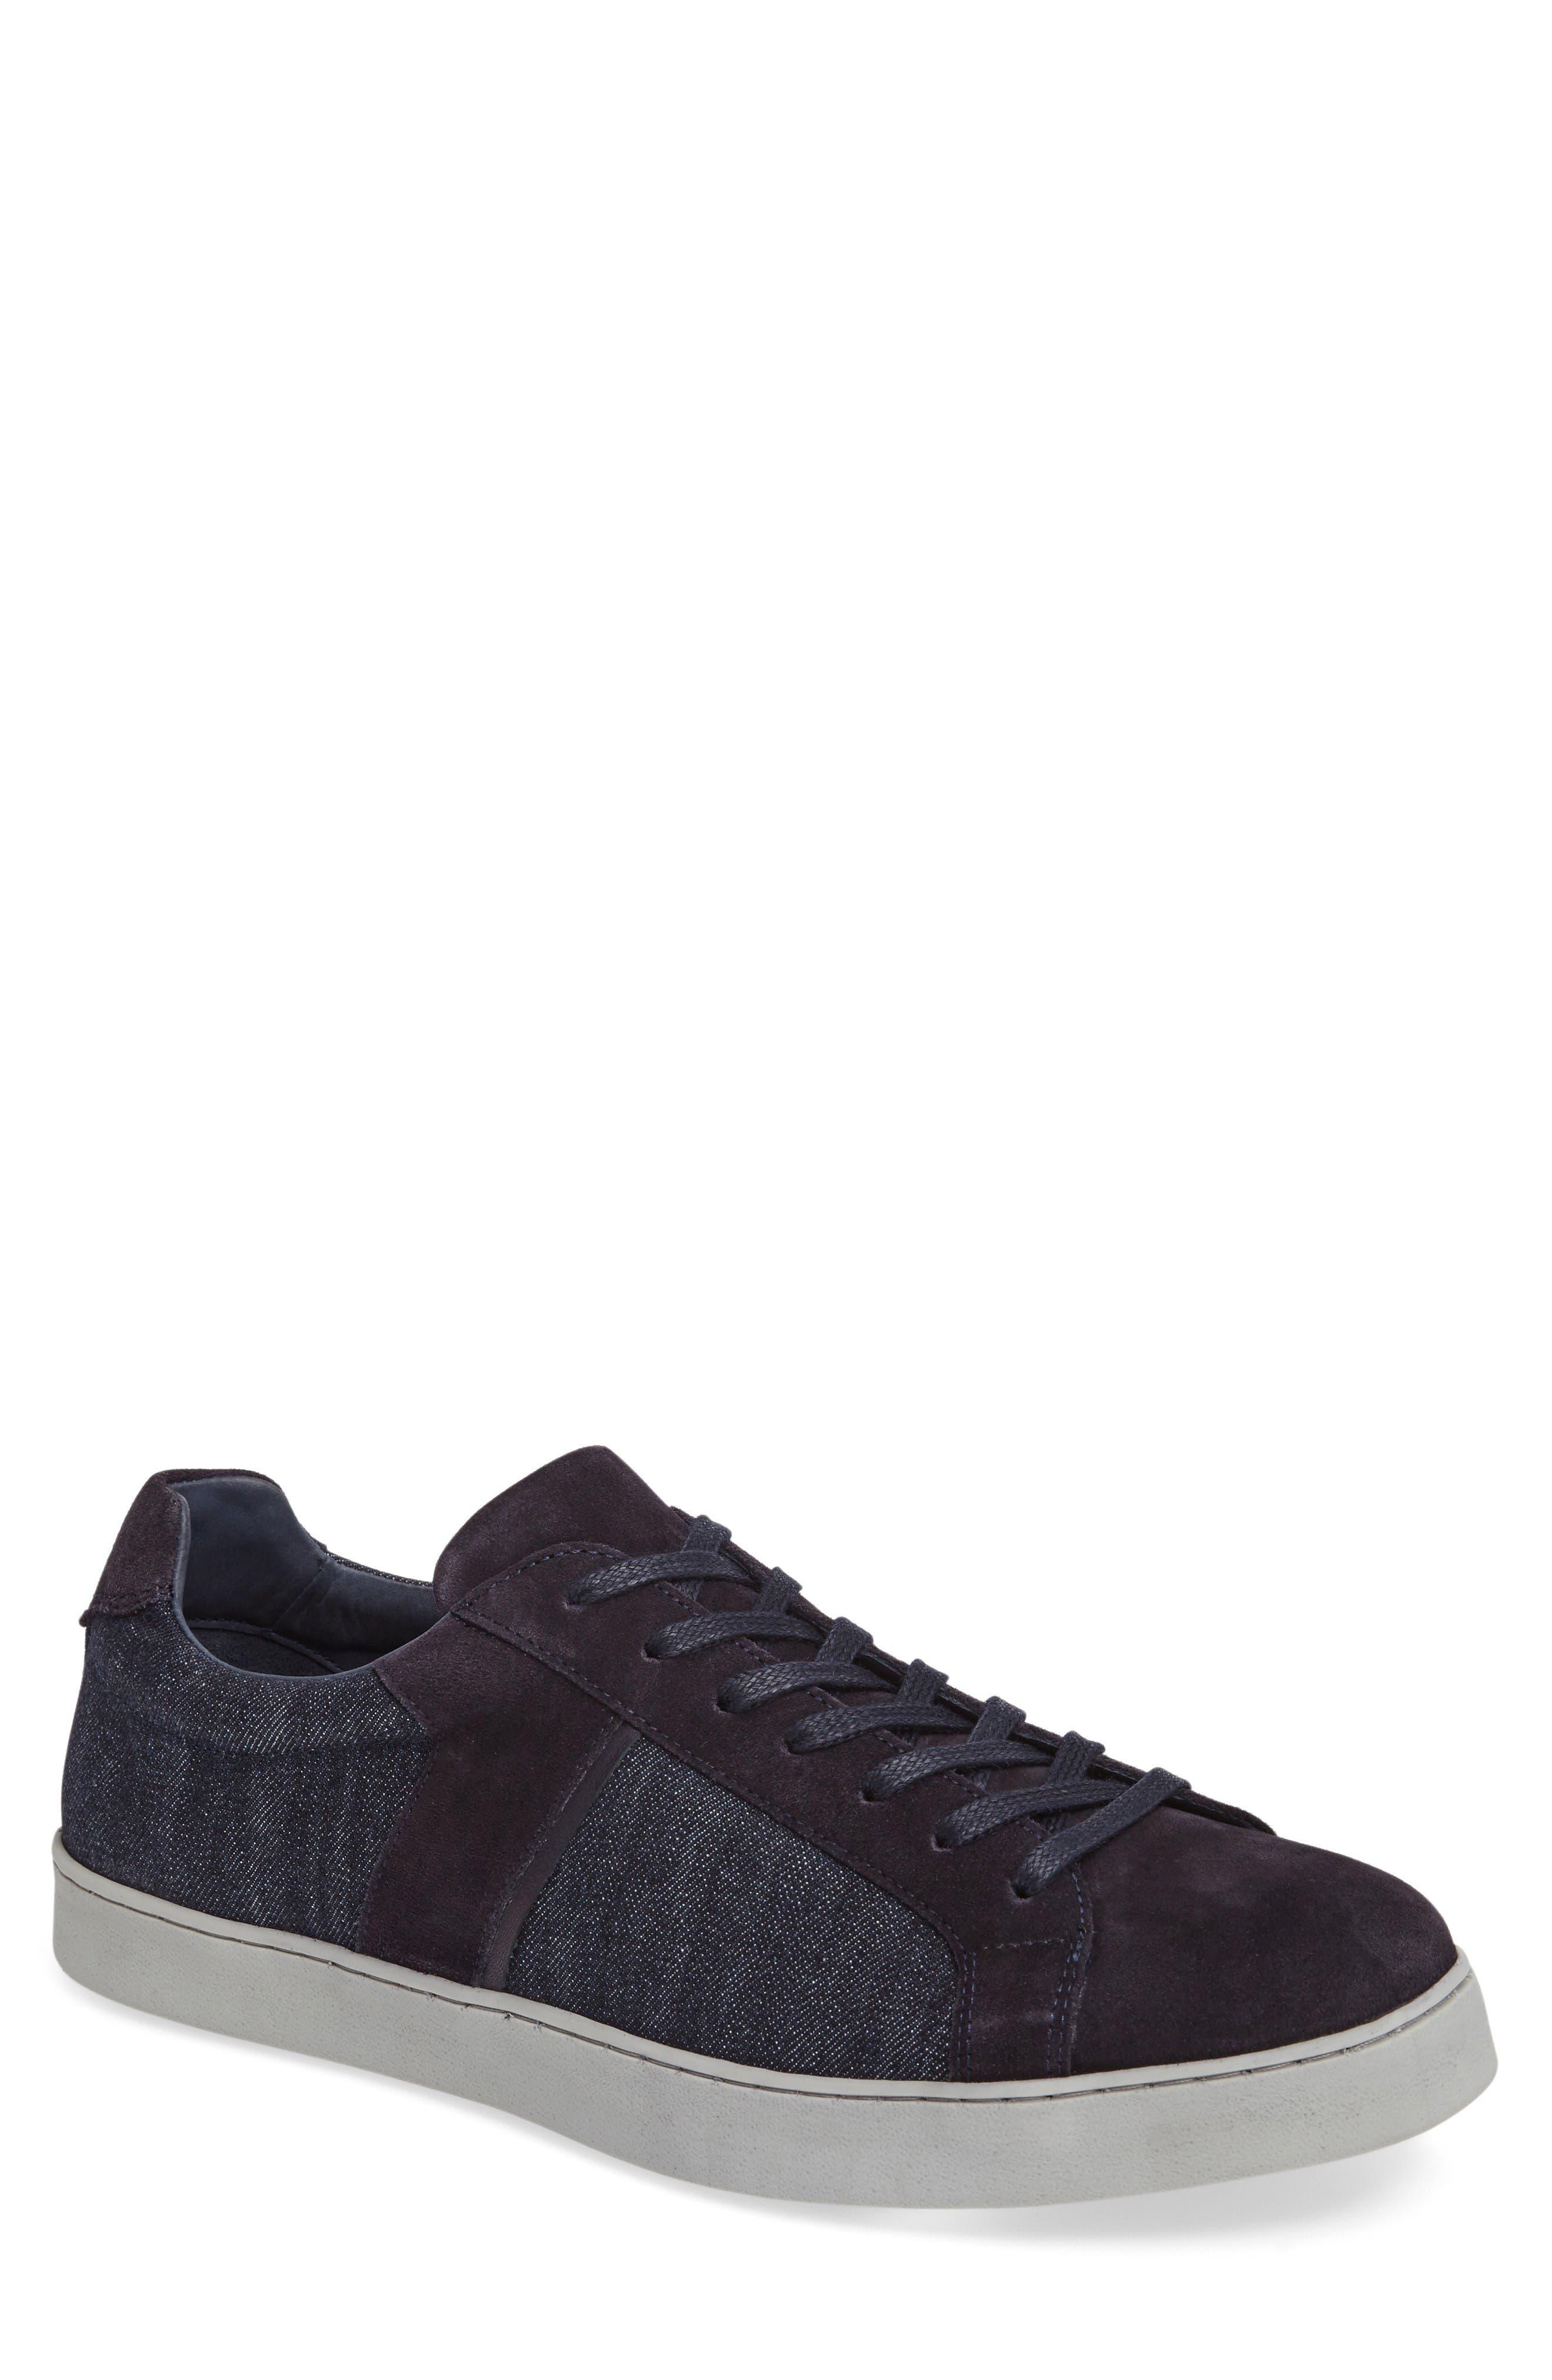 Ginx Sneaker,                         Main,                         color, Marino Suede